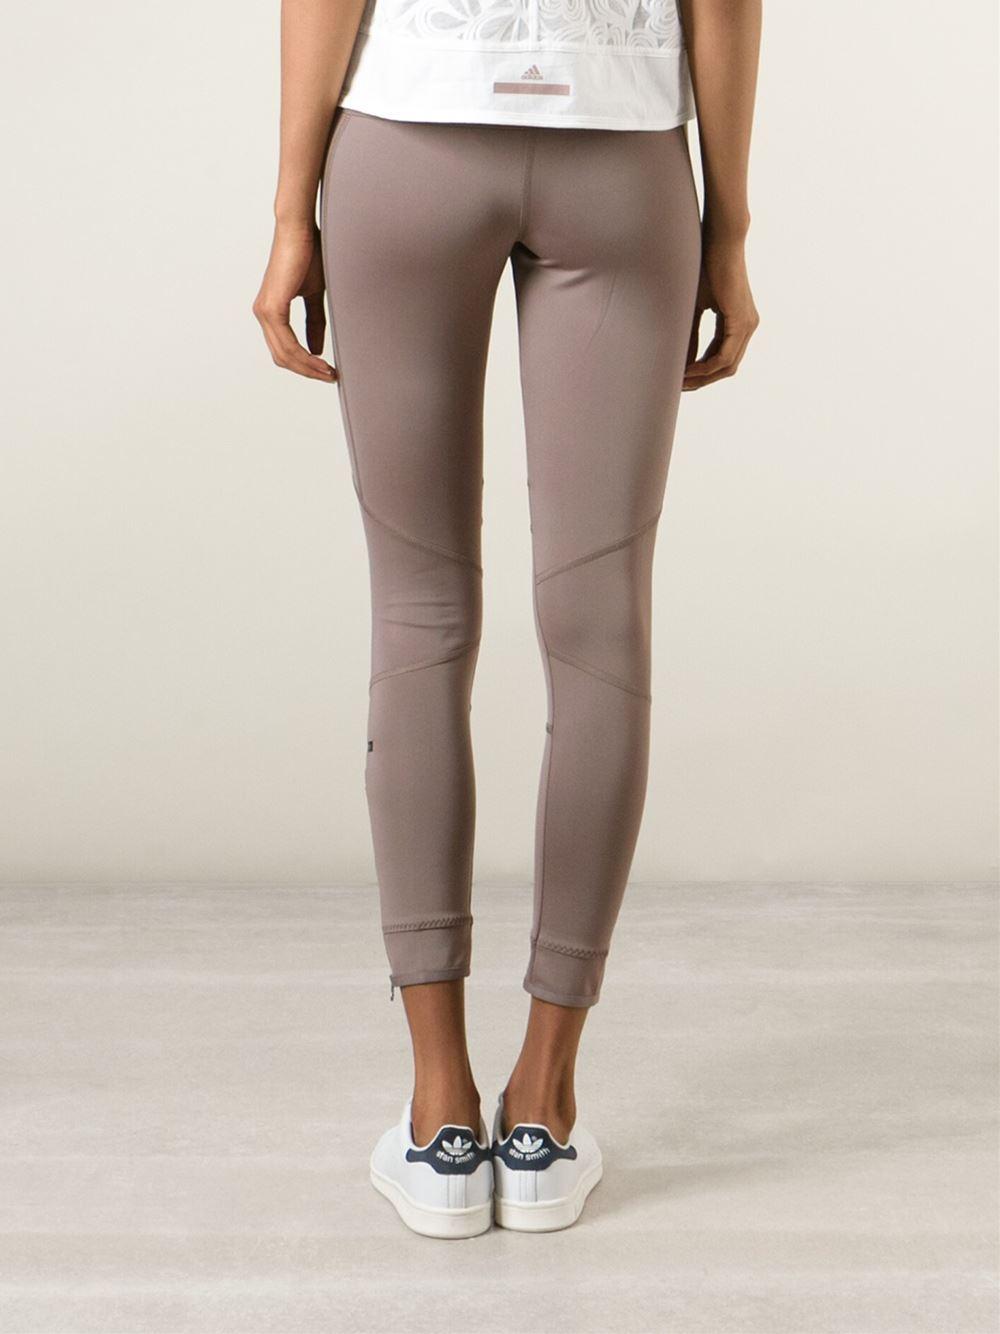 Adidas by stella mccartney 'run Winter' Leggings in Beige (nude ...